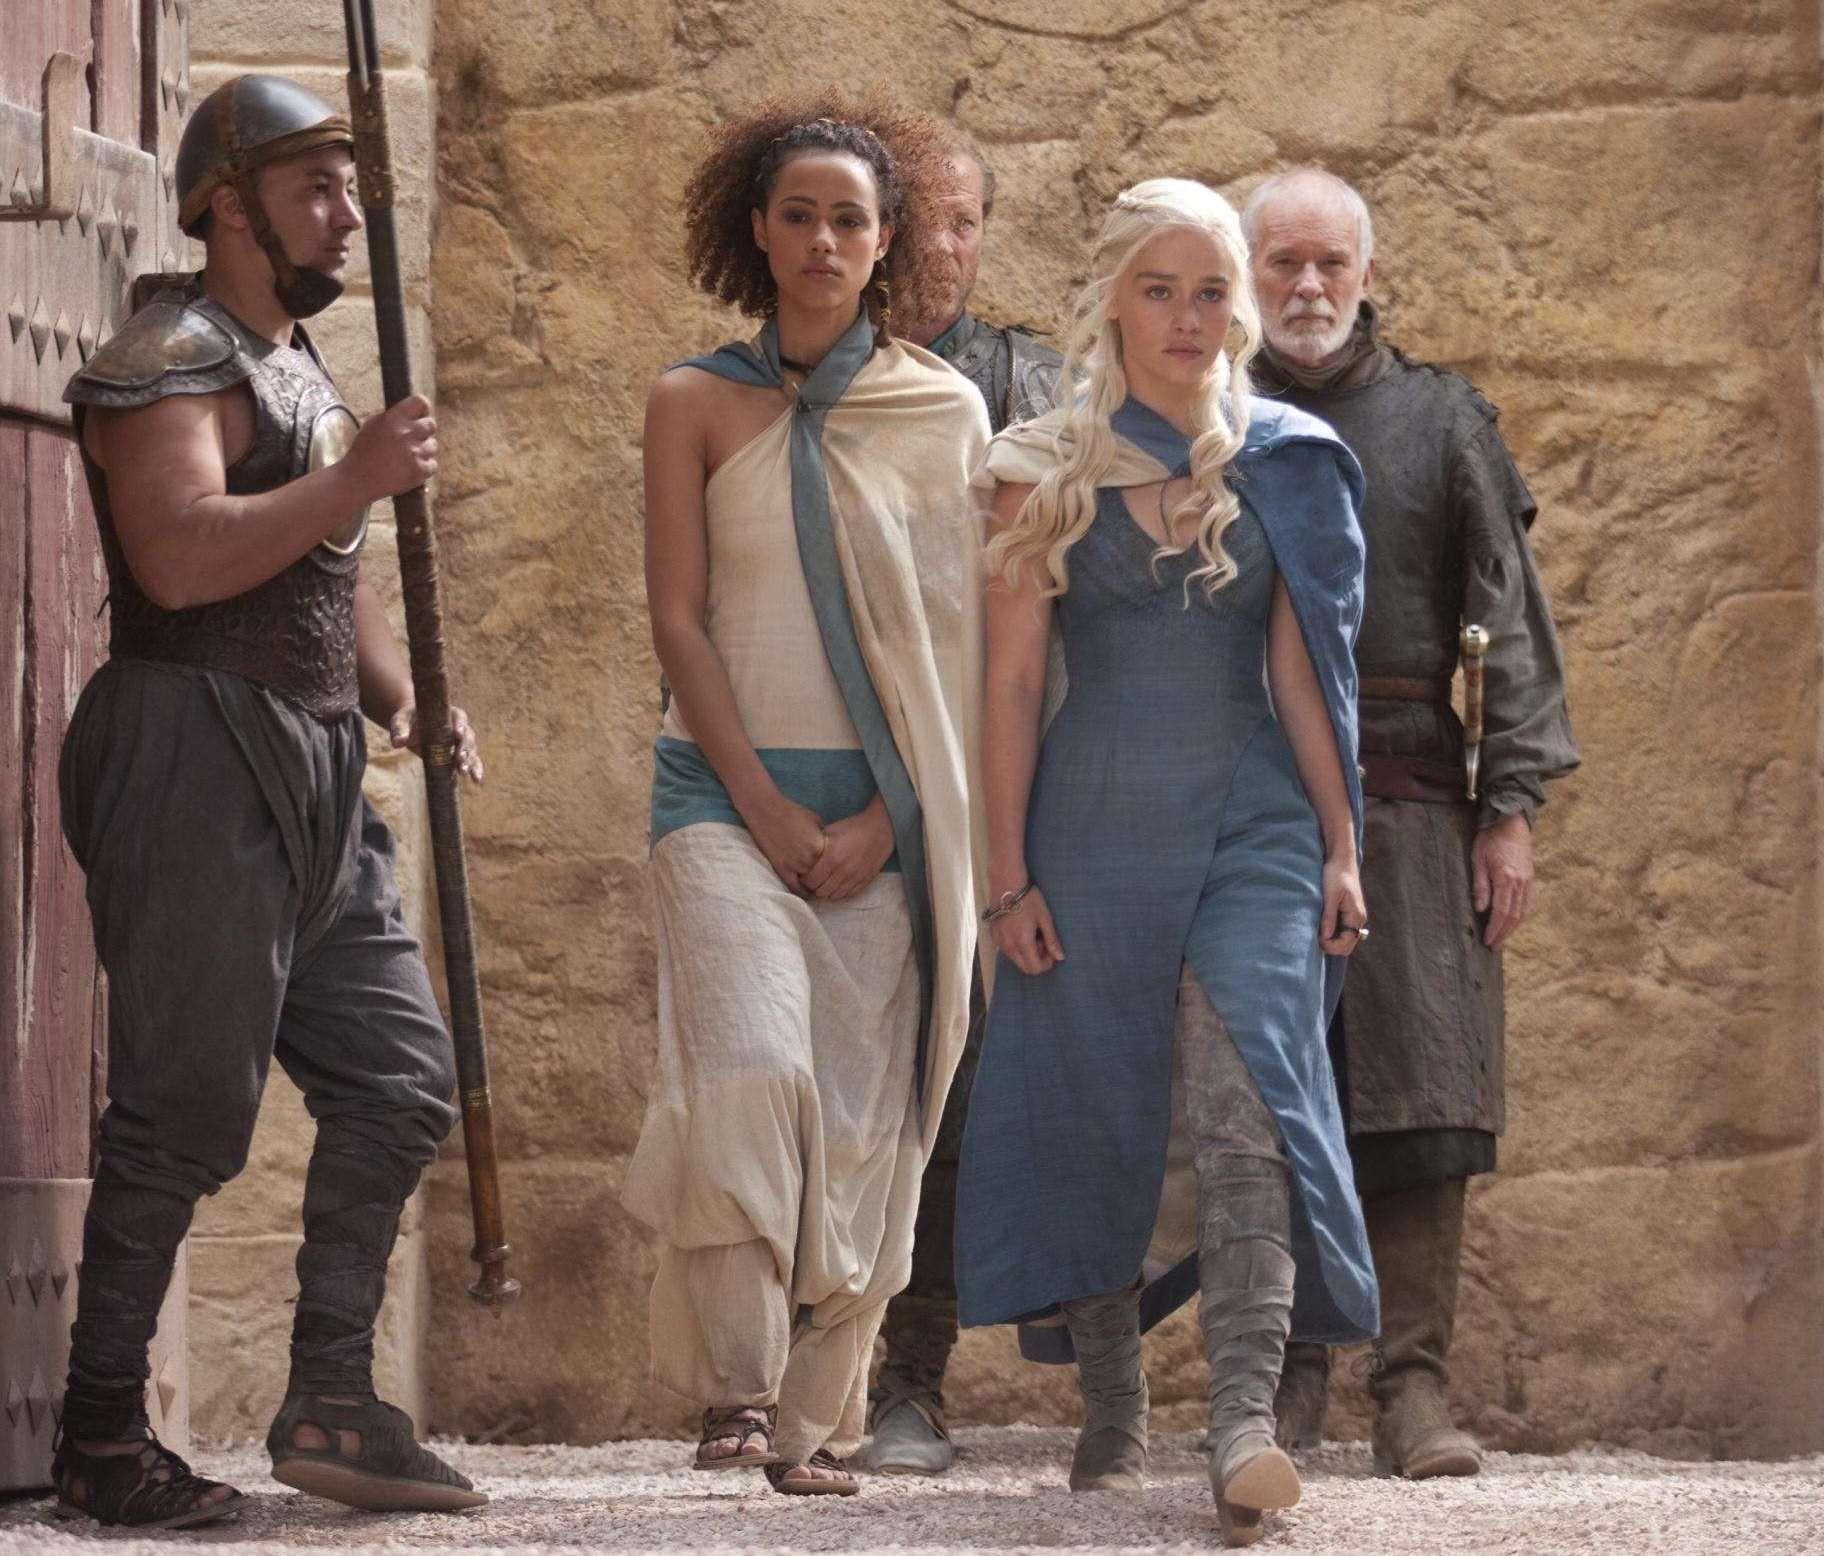 Game Of Thrones - TV Série - books (livros) - A Song of Ice and Fire (As Crônicas de Gelo e Fogo) - blond hair (cabelo loiro) - House Targaryen - family (família) - Daenerys Targaryen (Emilia Clarke) - Mother of Dragons (Mãe dos Dragões) - Mhysa - Queen (rainha) - Khaleesi - dress - vestido - blue - azul - Missandei (Nathalie Emmanuel) - guard - guarda - soldier - soldado - advice - conselheiro - Knight - cavaleiro - friend - amigo - Jorah Mormont (Iain Glen) - Barristan Selmy (Ian…